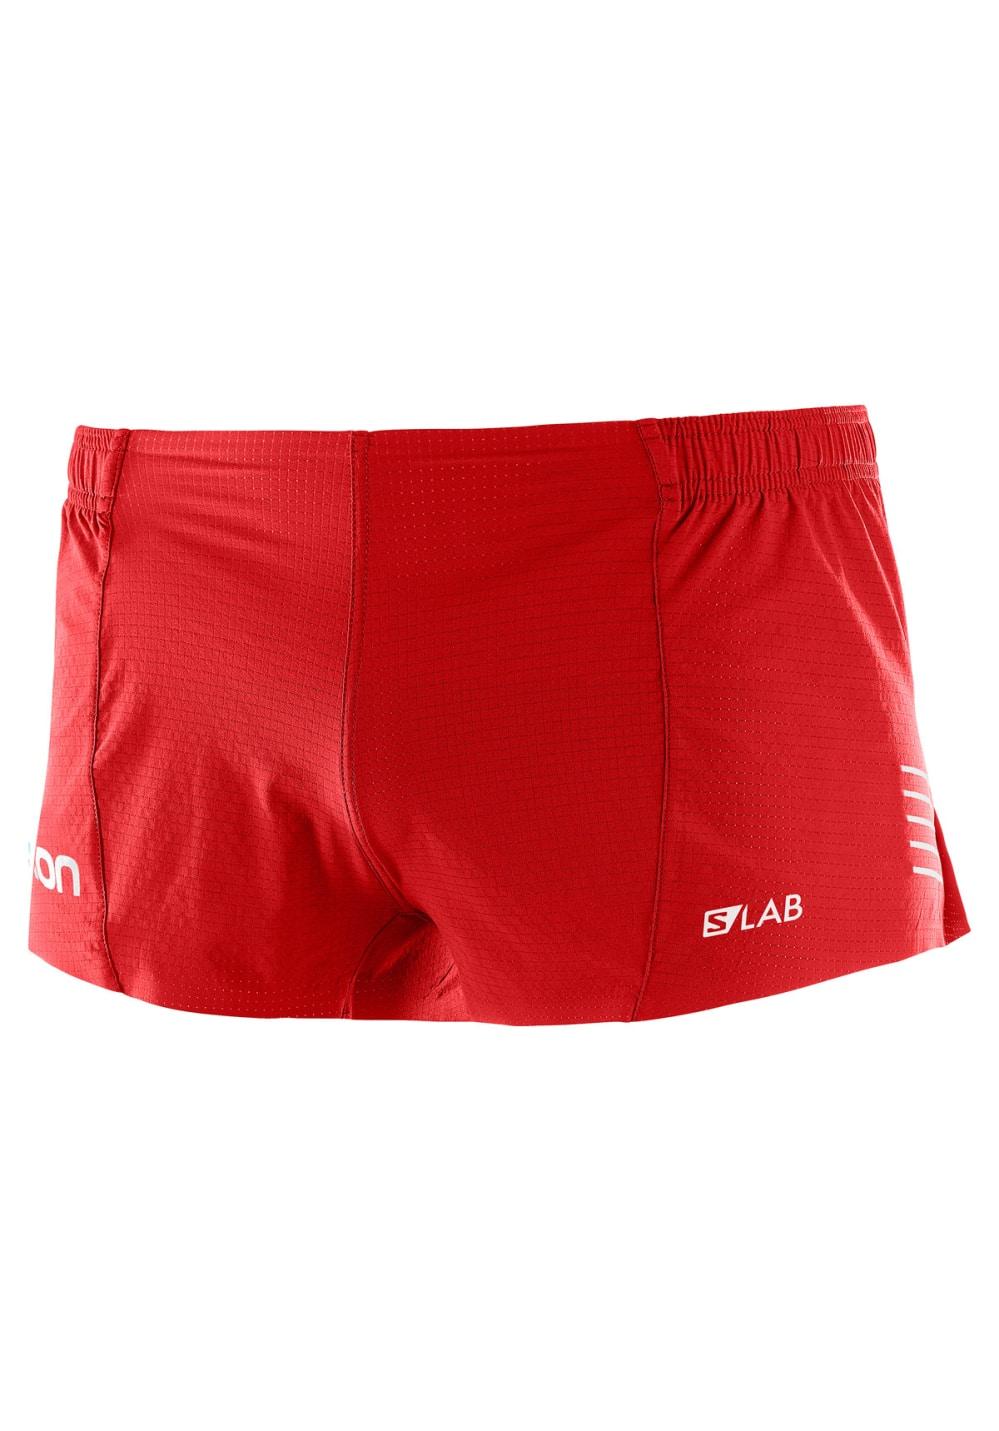 b4e8780a Salomon S-Lab Short 4 - Running trousers for Men - Red